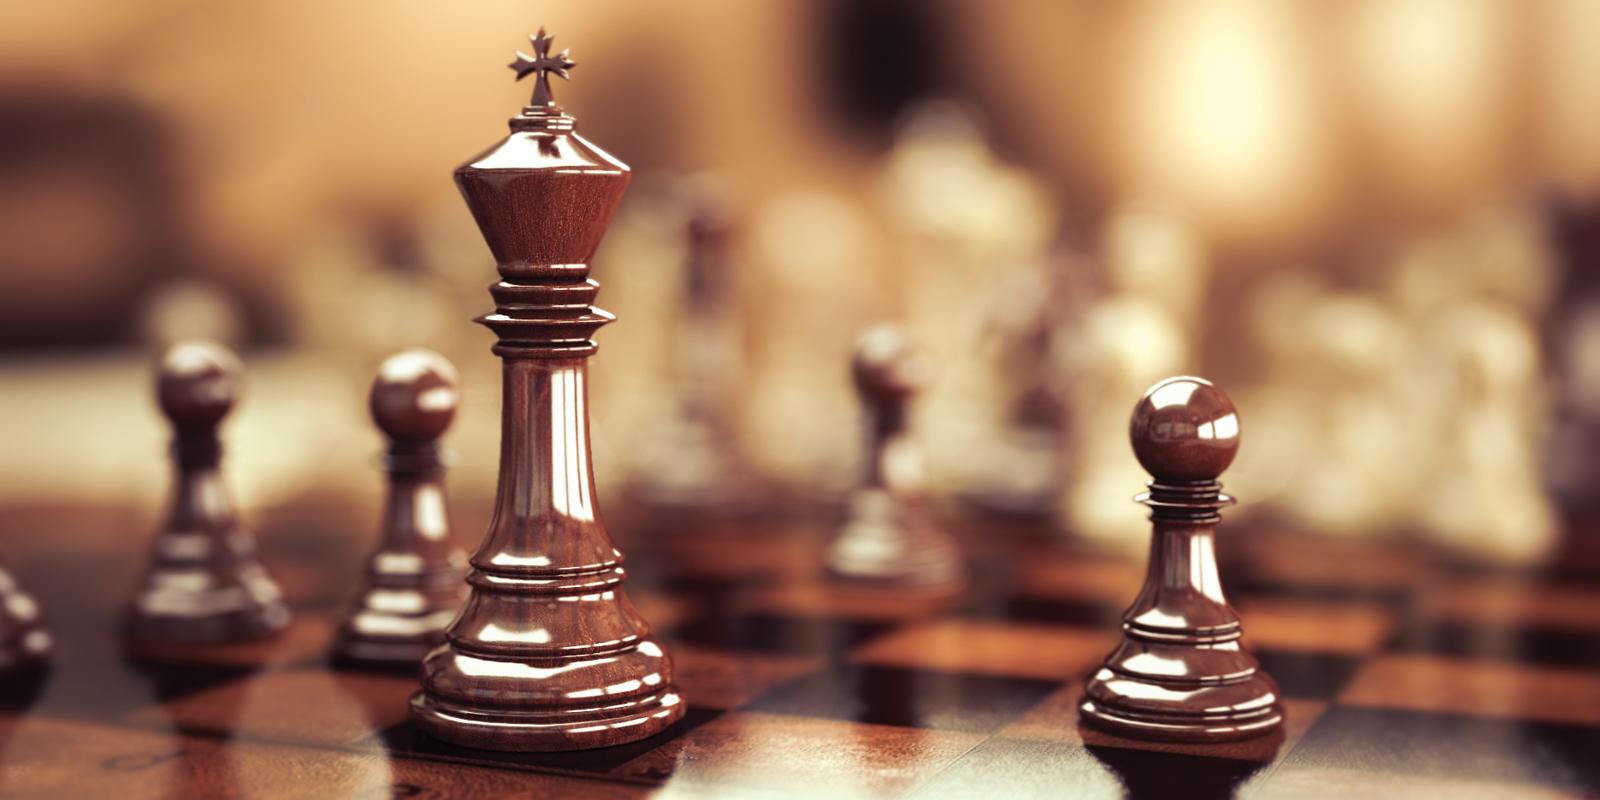 Международный турнир Tata Steel Chess. Вейк-а-Зее, Нидерланды 10.01 - 26.01. 2020